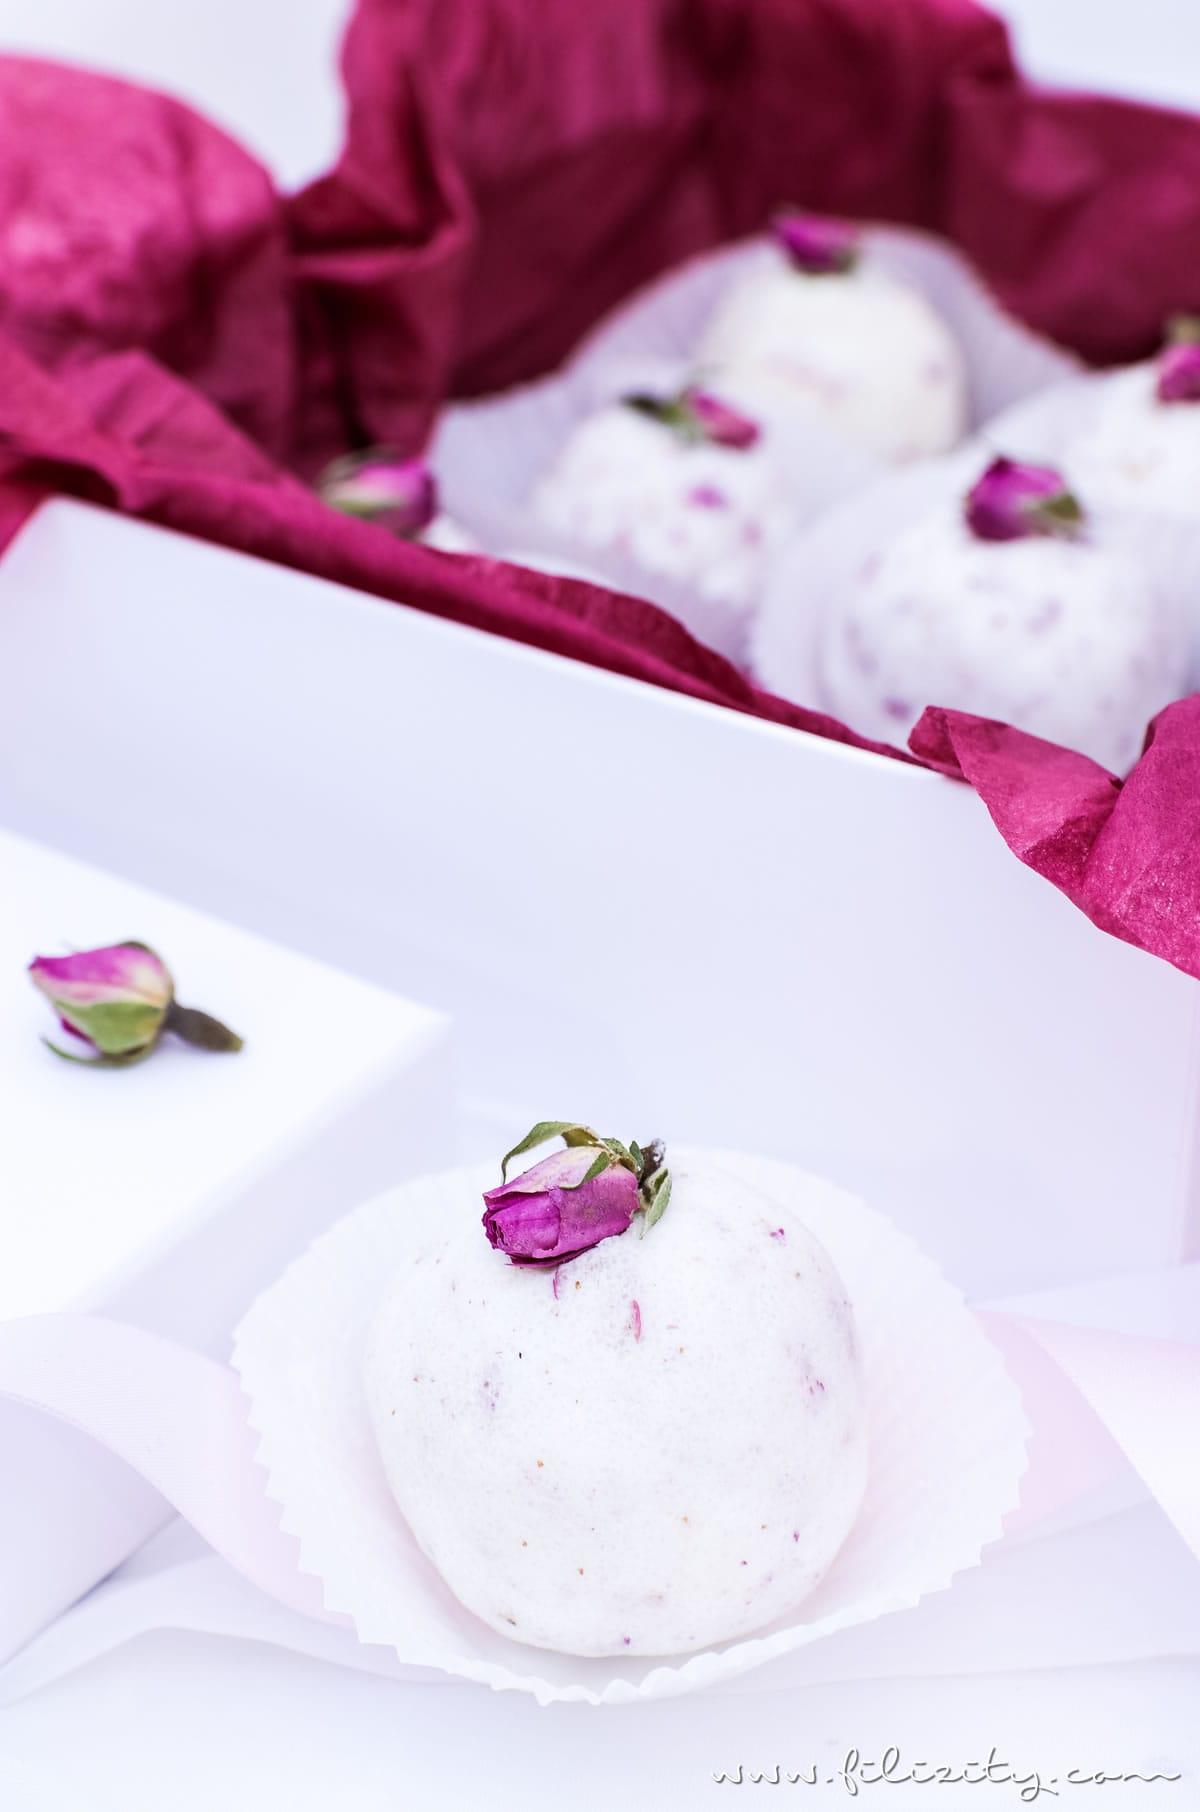 DIY Geschenkidee zum Muttertag oder Valentinstag: Home Spa Set | Home Spa Box / Wellness-Box selber machen | Filizity.com | Beauty- & DIY-Blog aus dem Rheinland #muttertag #geschenkidee #valentinstag